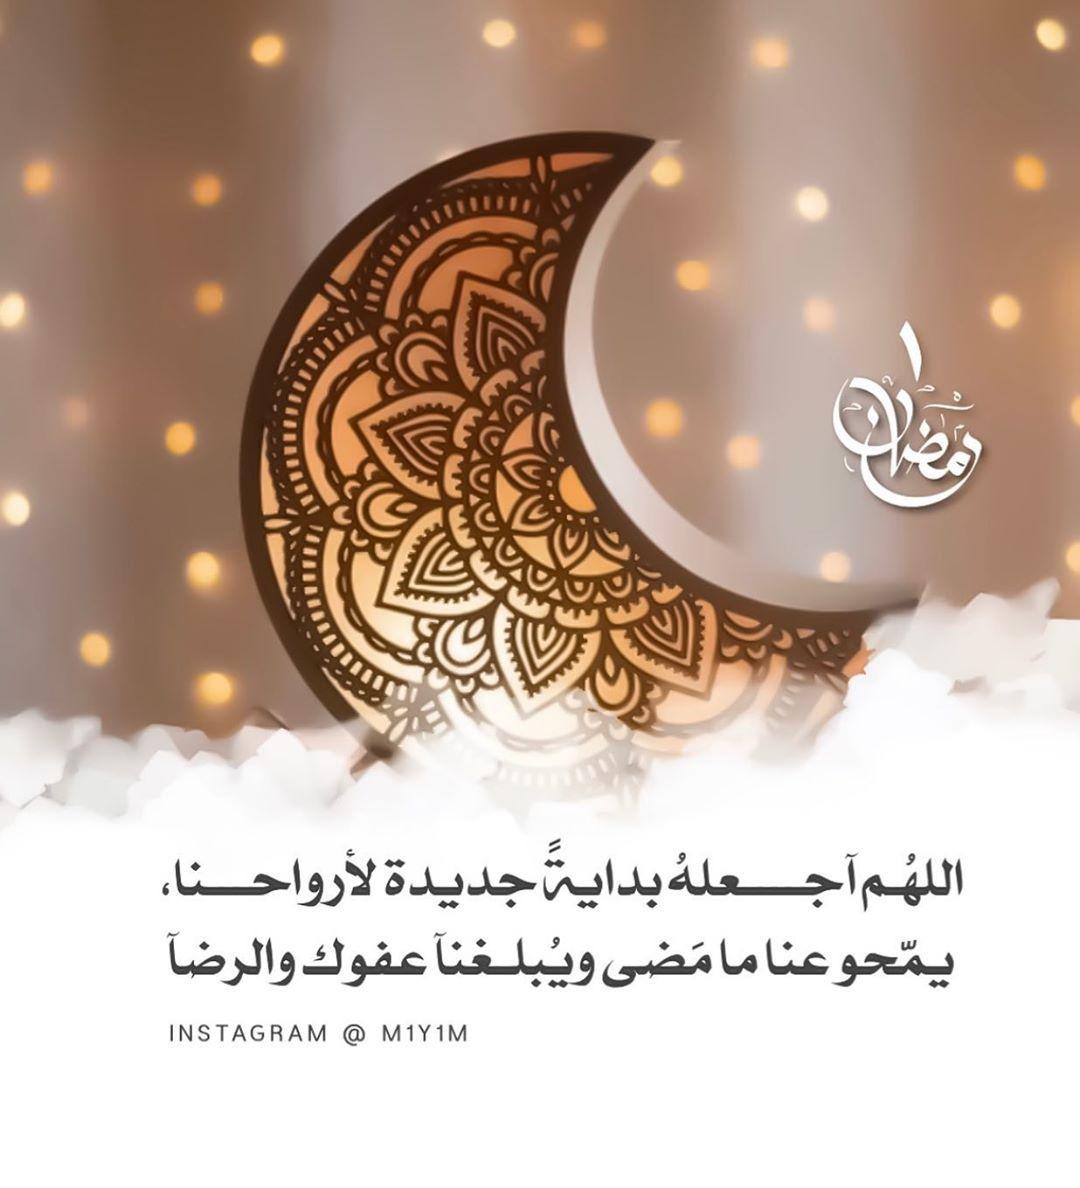 Mrs Mona On Instagram يارب Follow Me M1y1m Give Me Like Put Y Ramadan Celestial Bodies Celestial